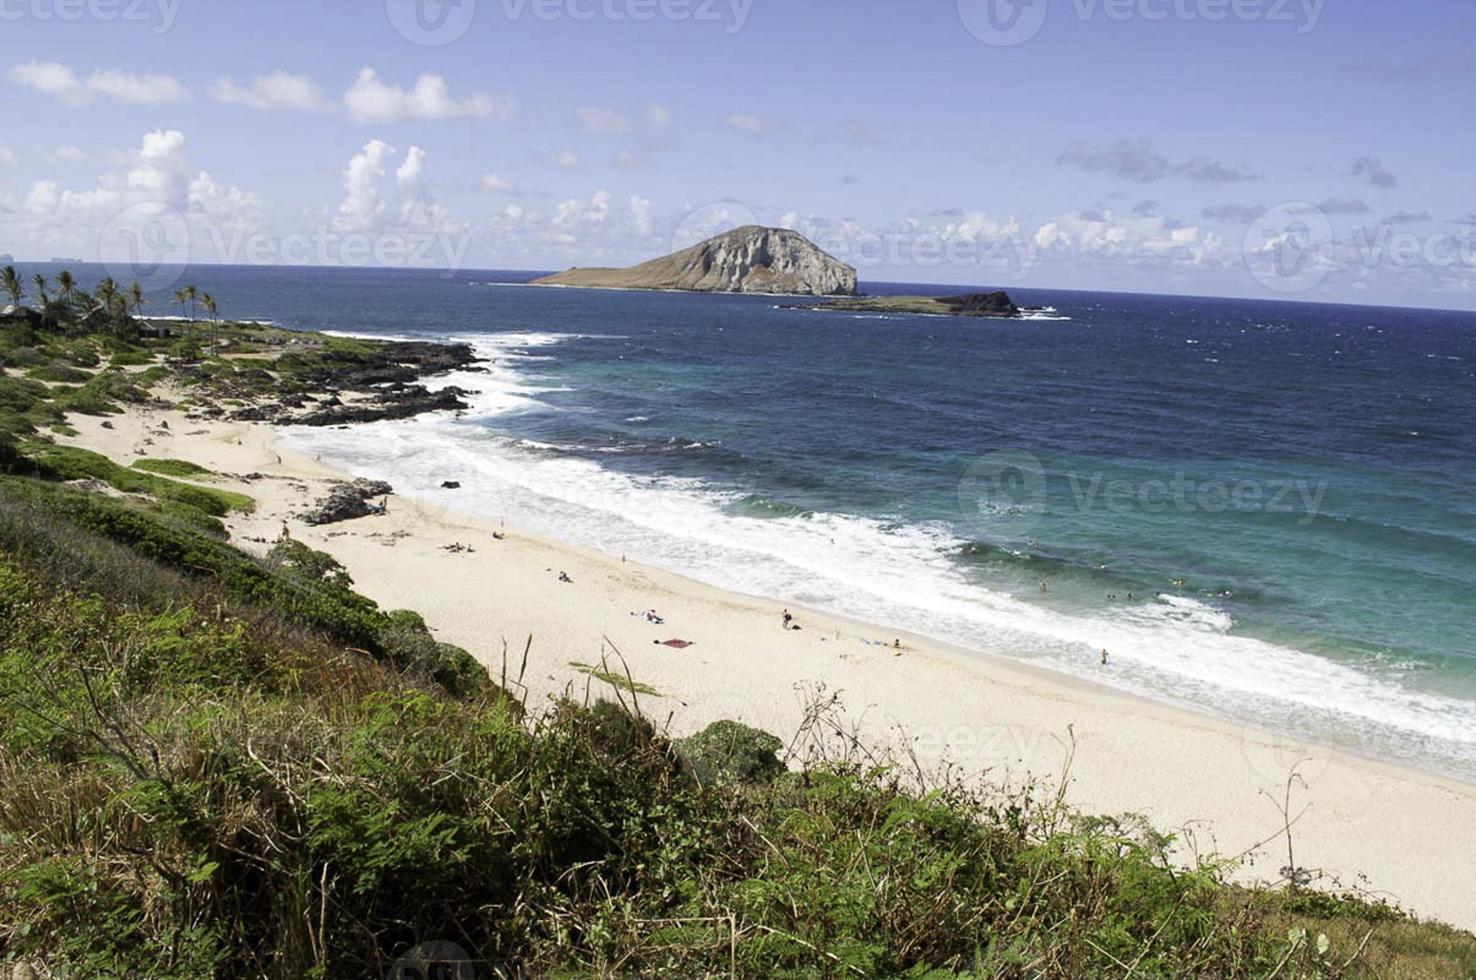 Makapu'u Beach Vista an einem sonnigen Tag. foto